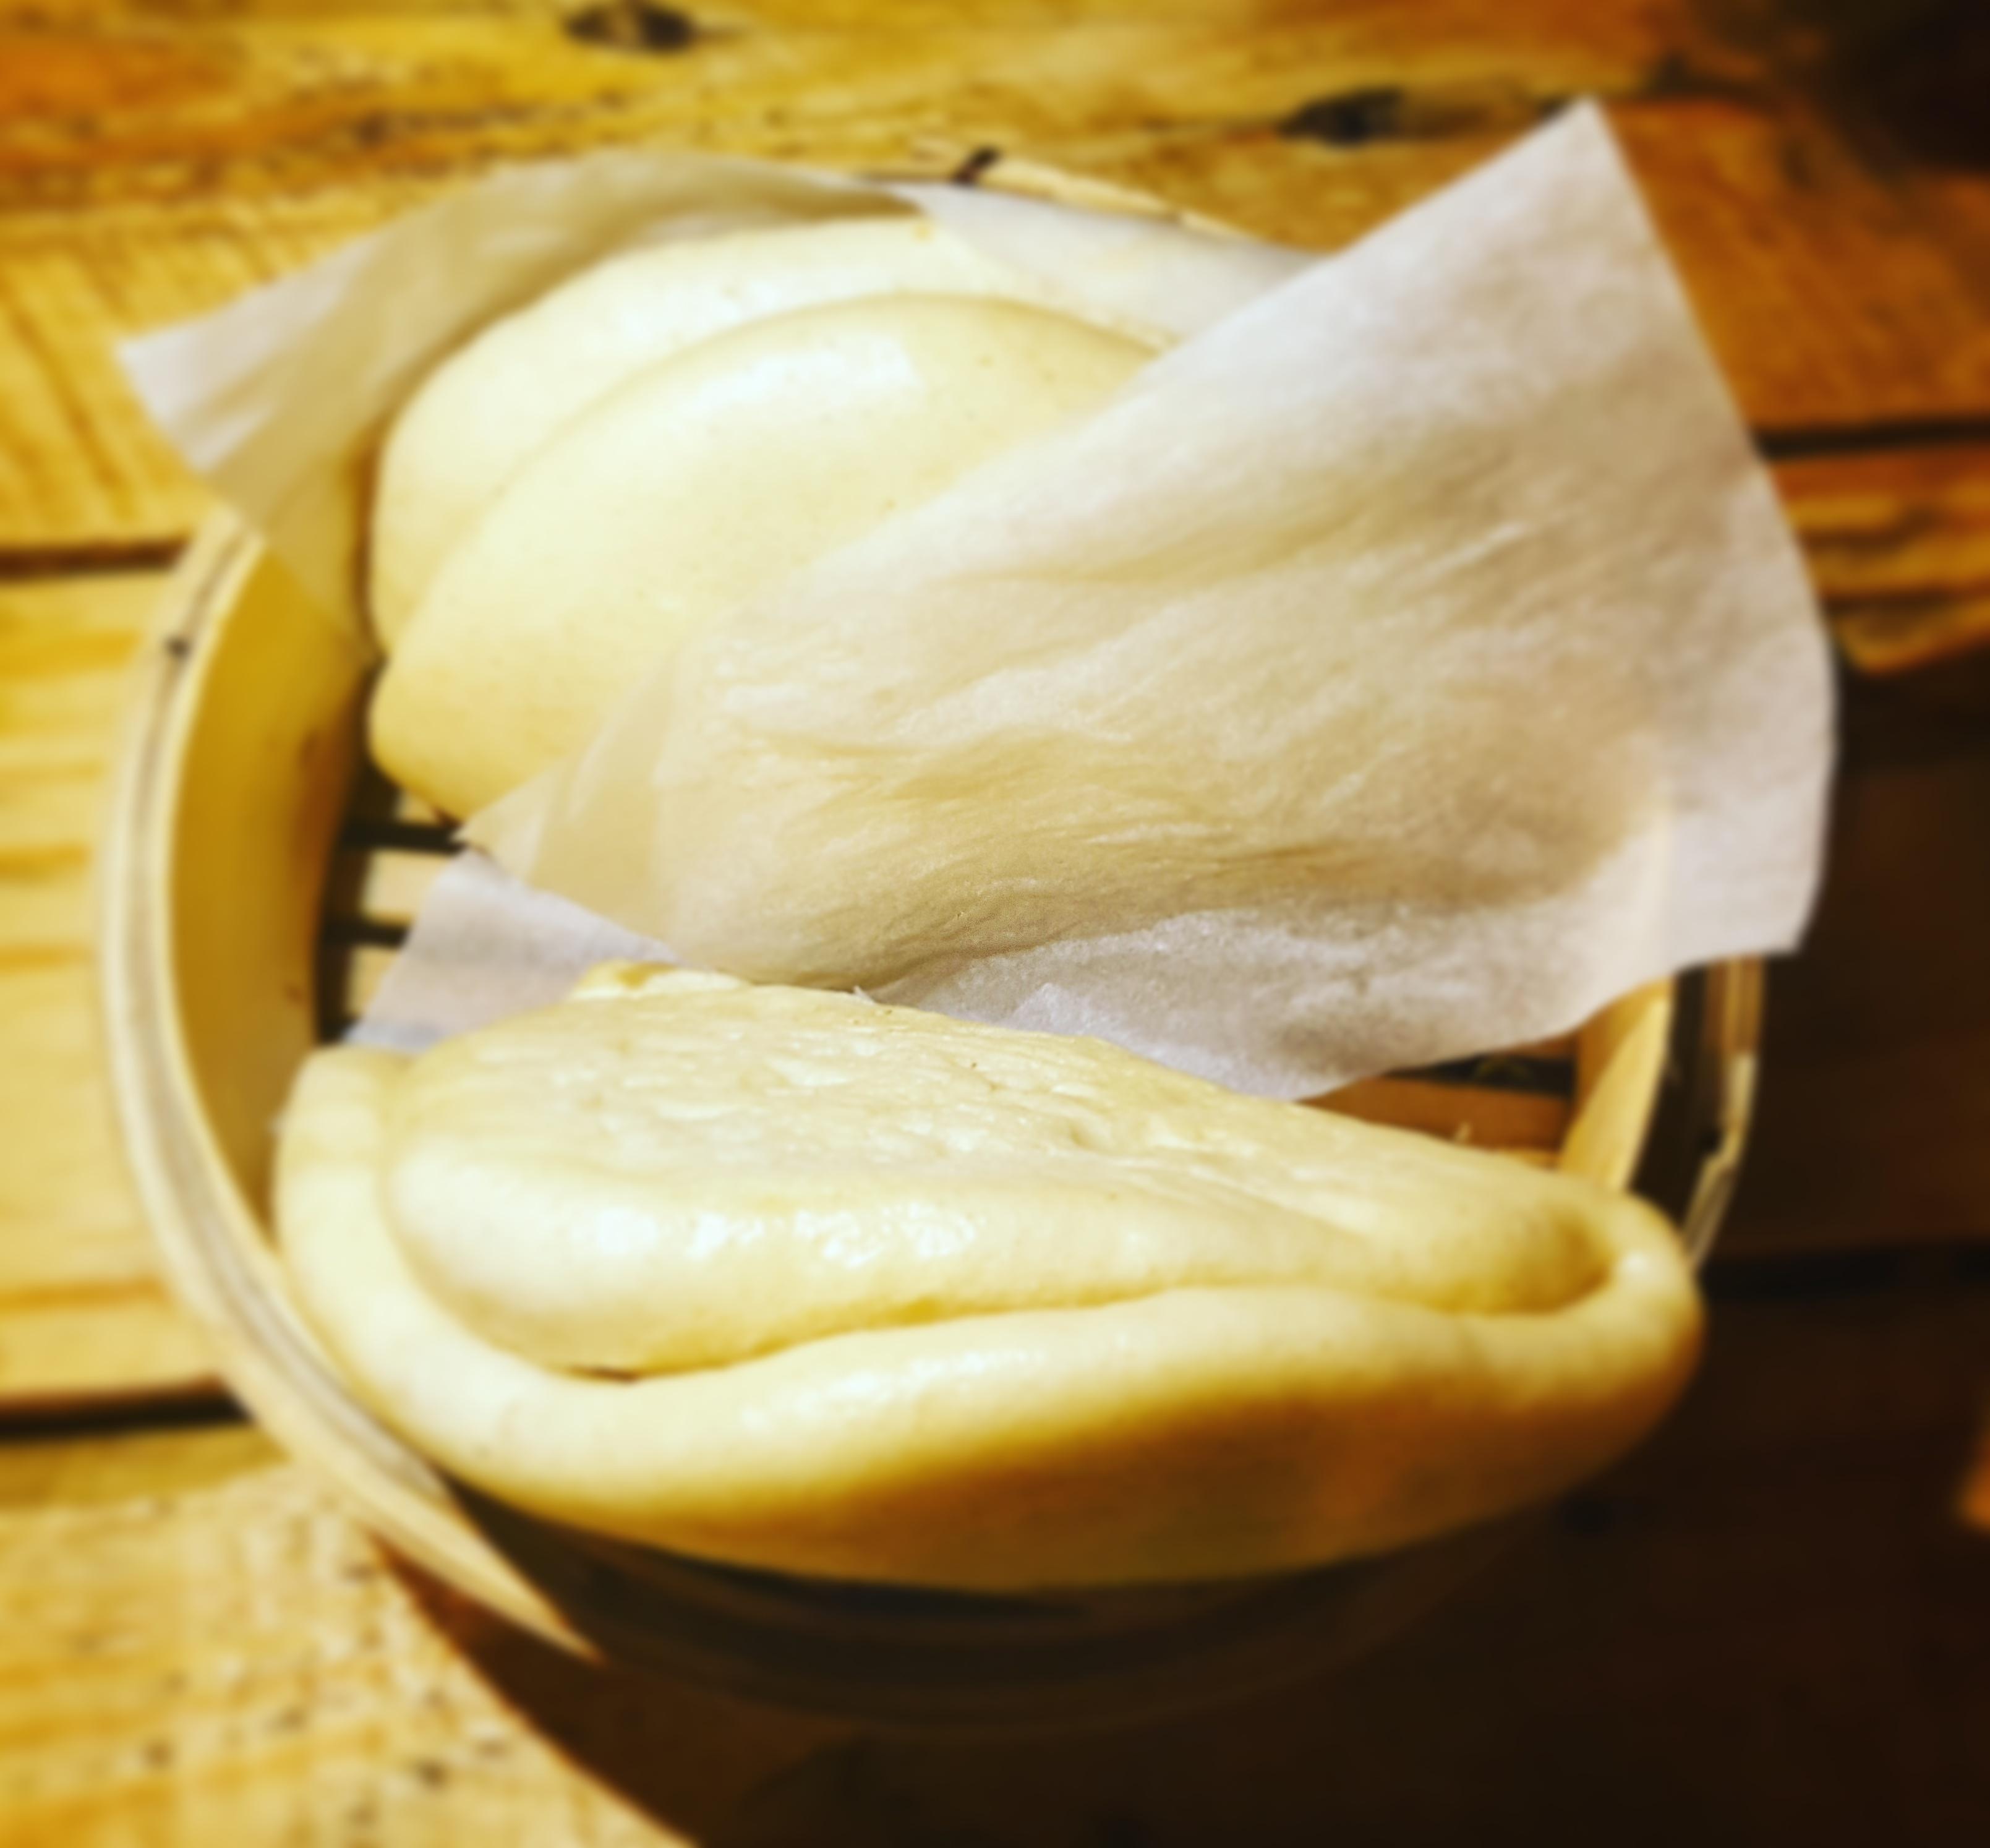 PaperJam @ Bread And Bones